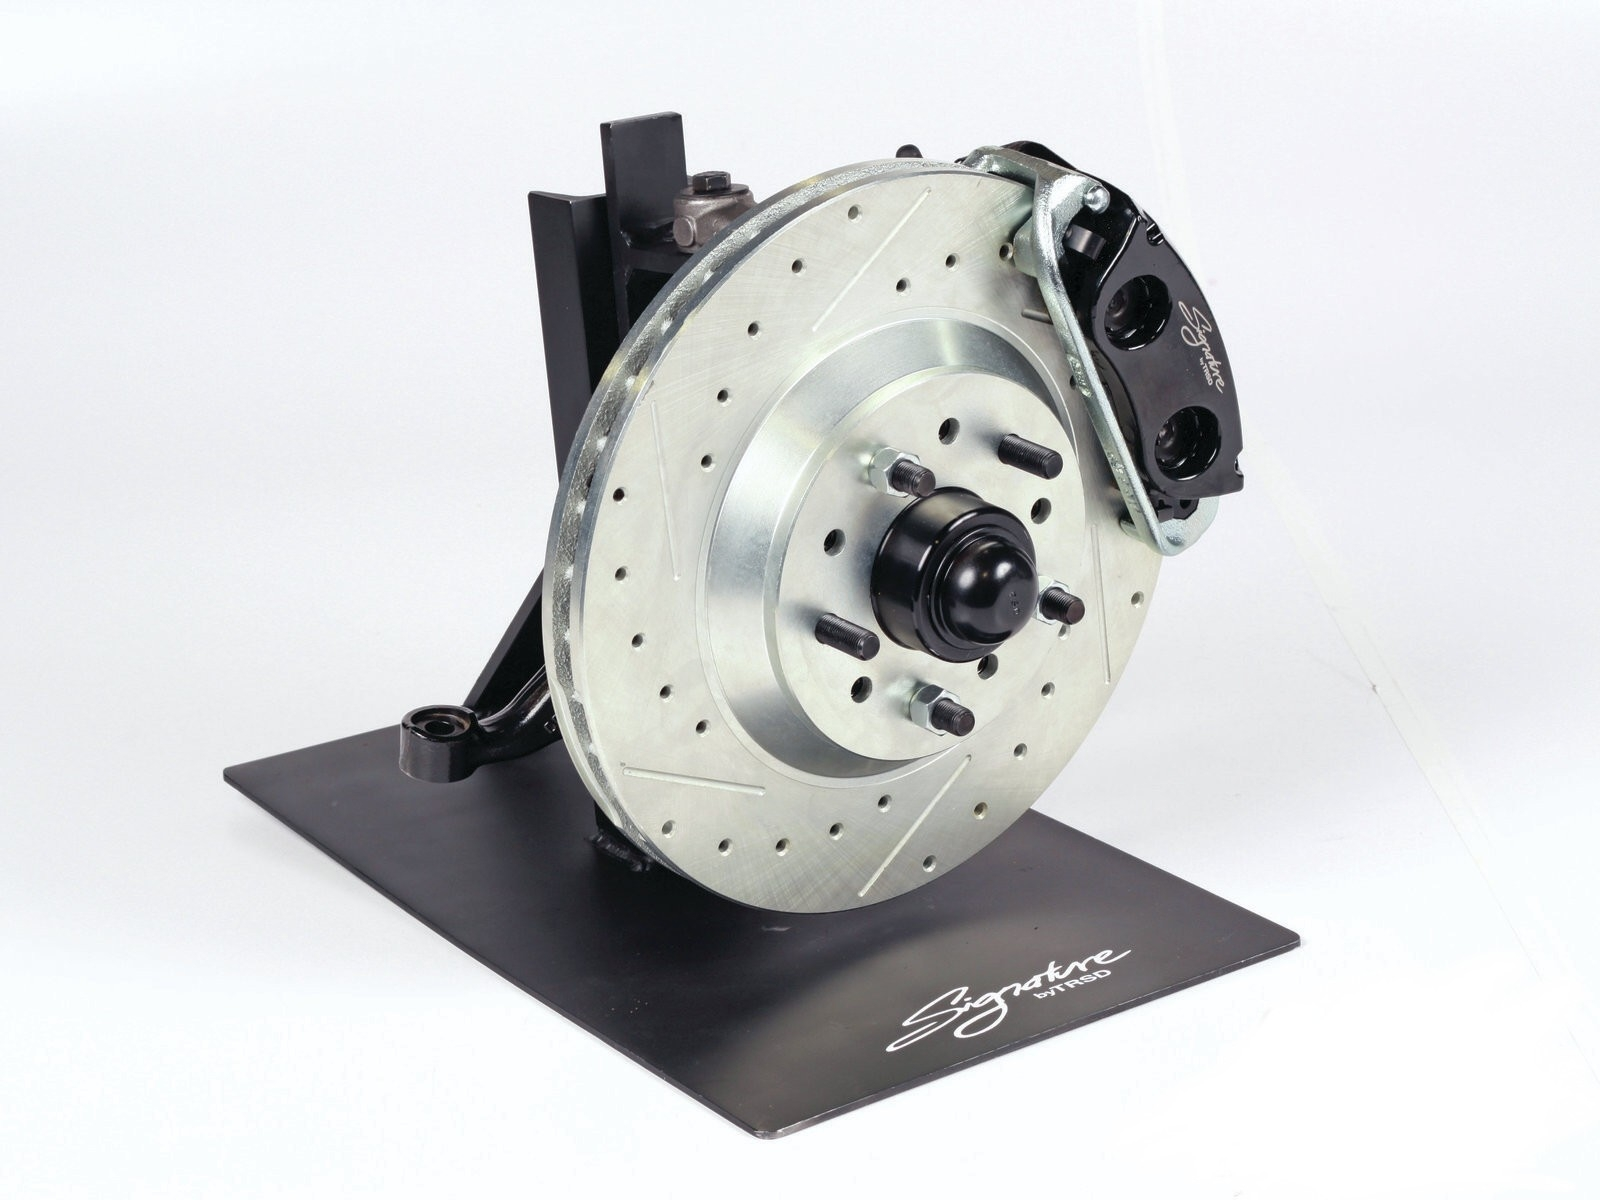 13 power 4 wheel disc brake and line kit big brakes steve s camaro parts 1967  [ 1600 x 1200 Pixel ]